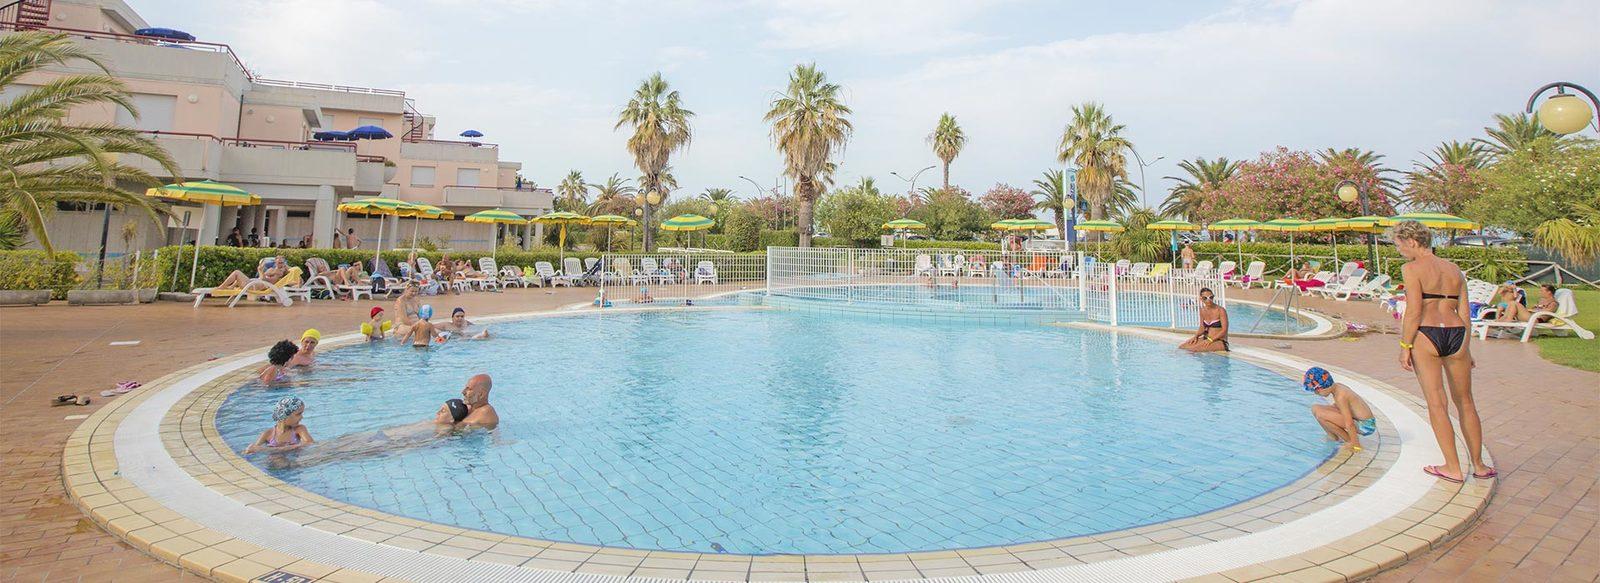 Resort 3* fronte mare